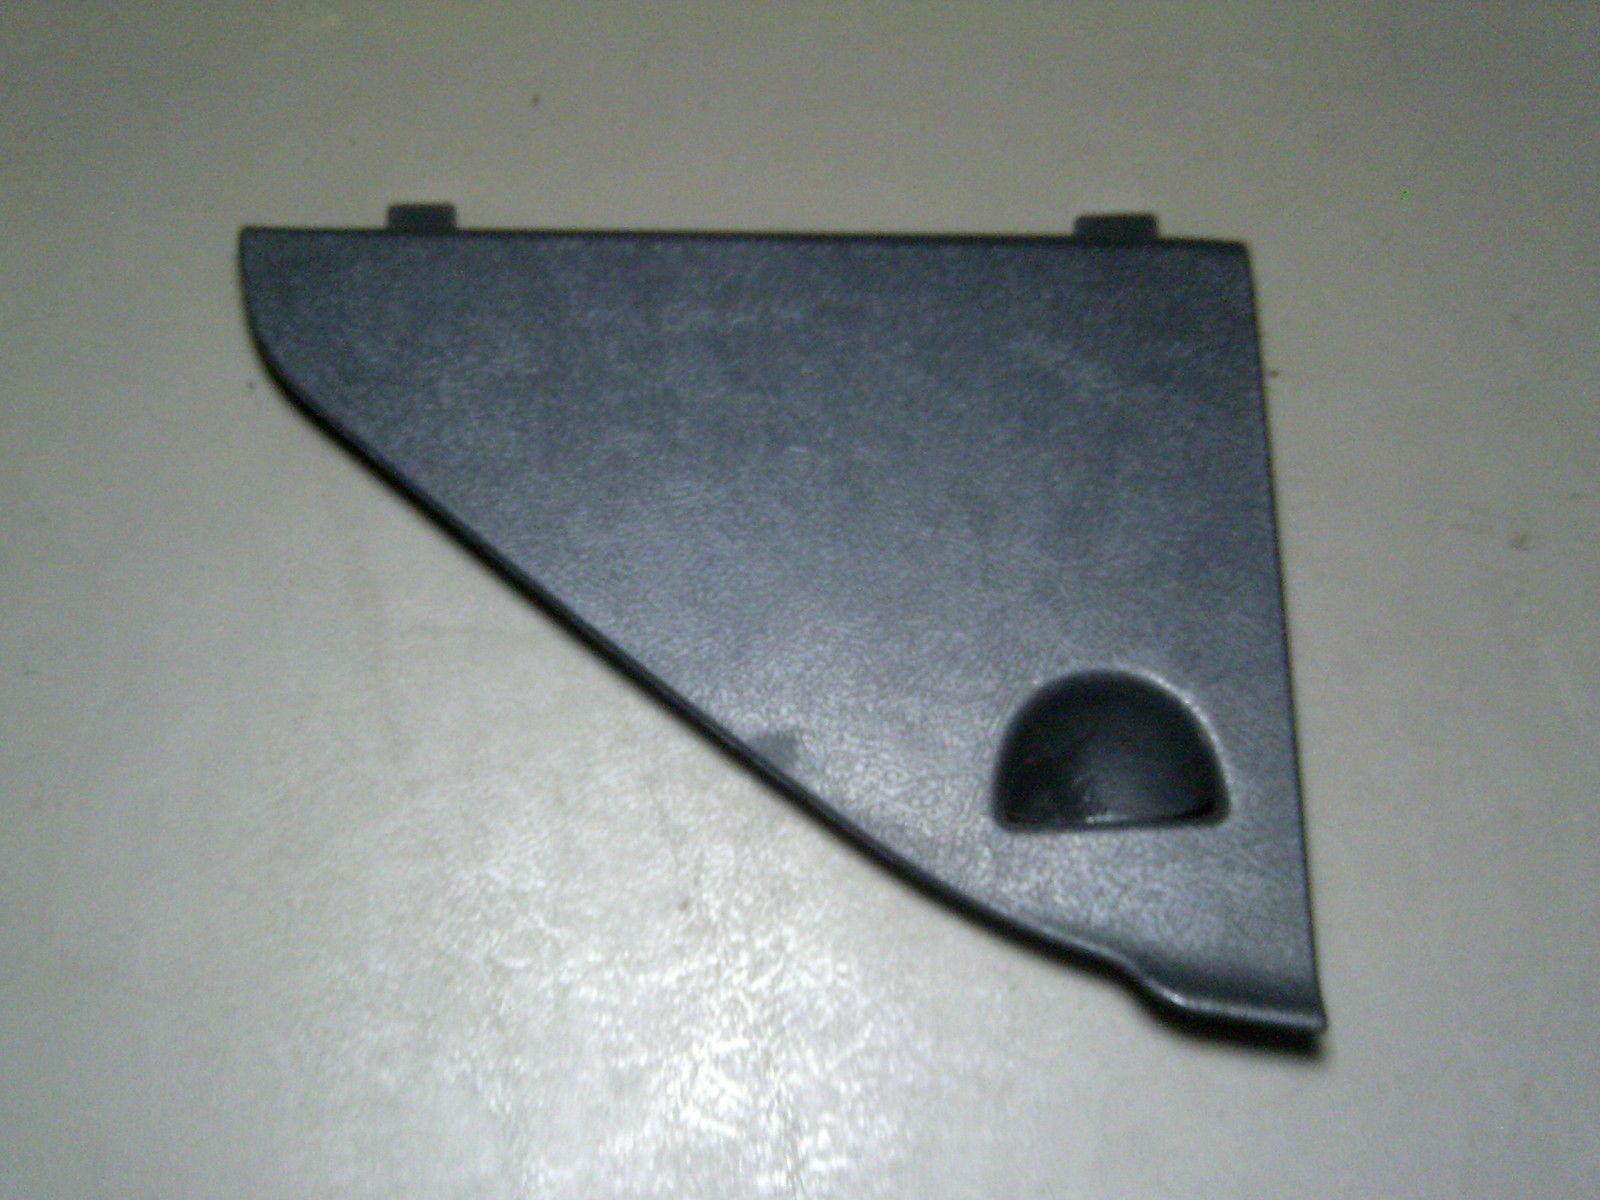 Fuse Box Door : Buick skylark under dash fuse box fusebox trim